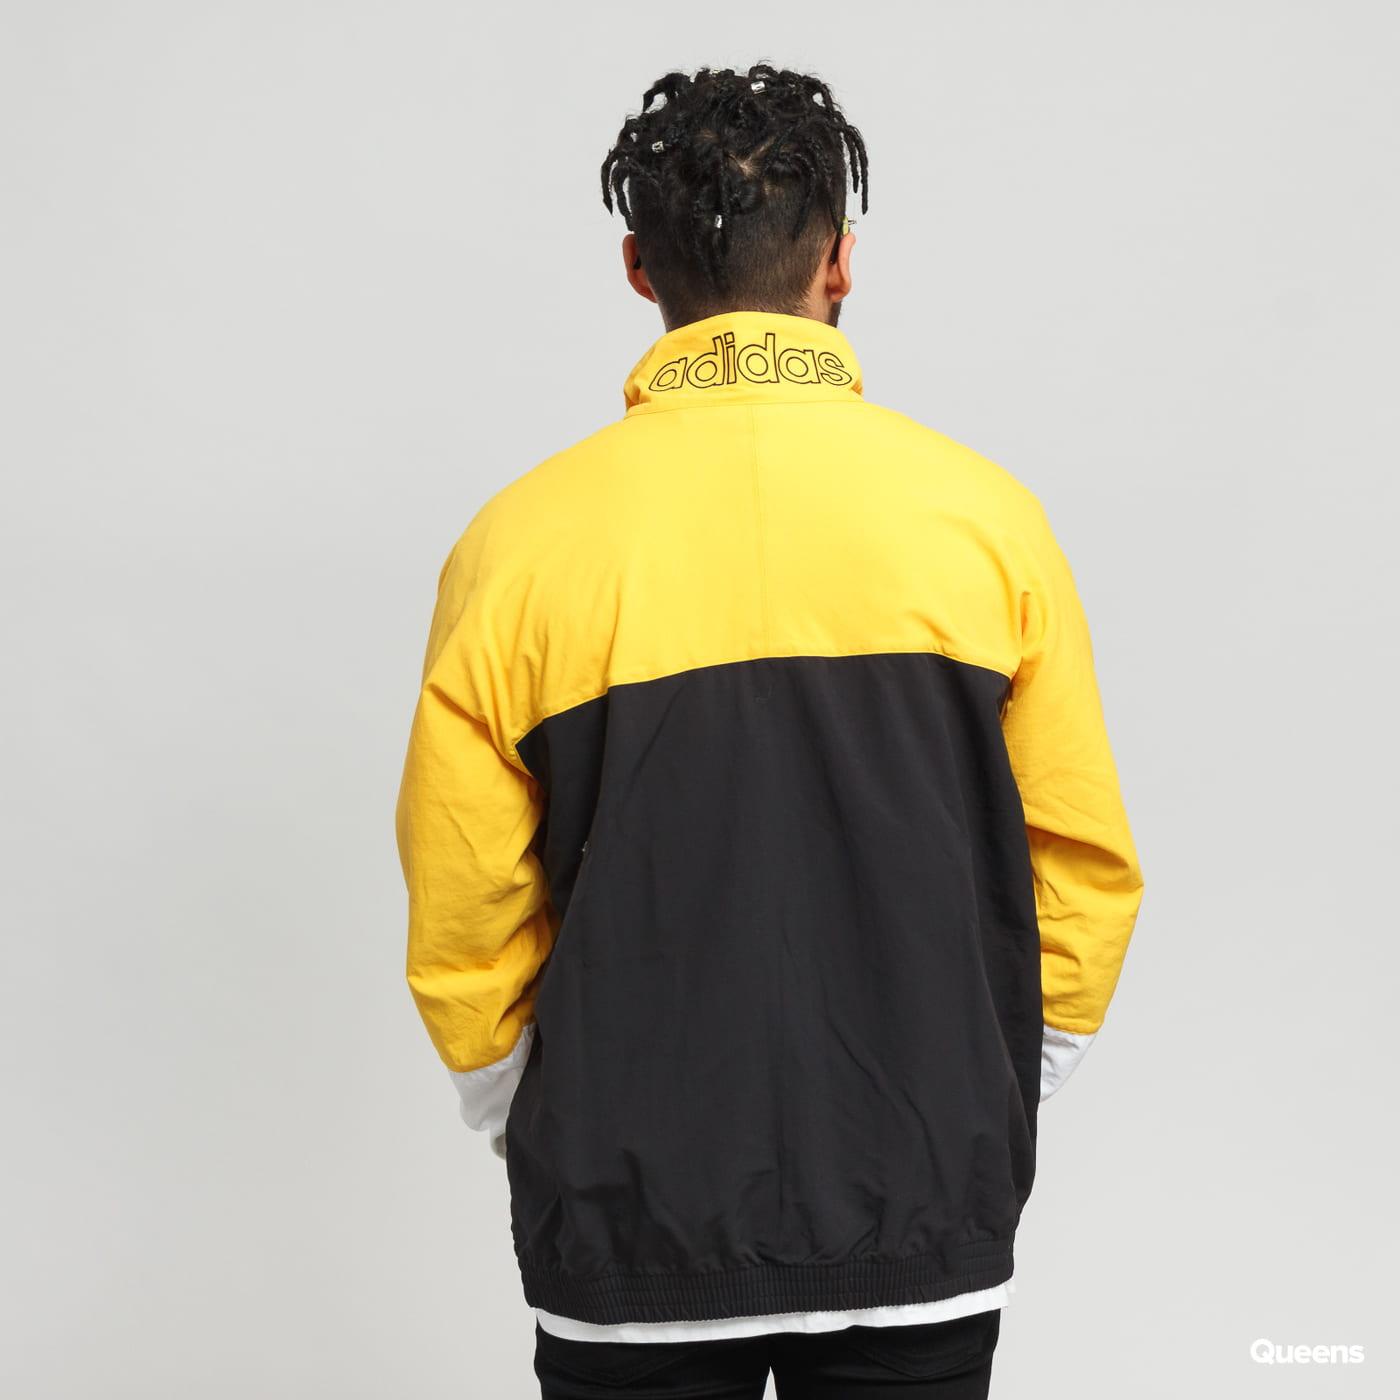 adidas Originals Blocked Warm Up black / yellow